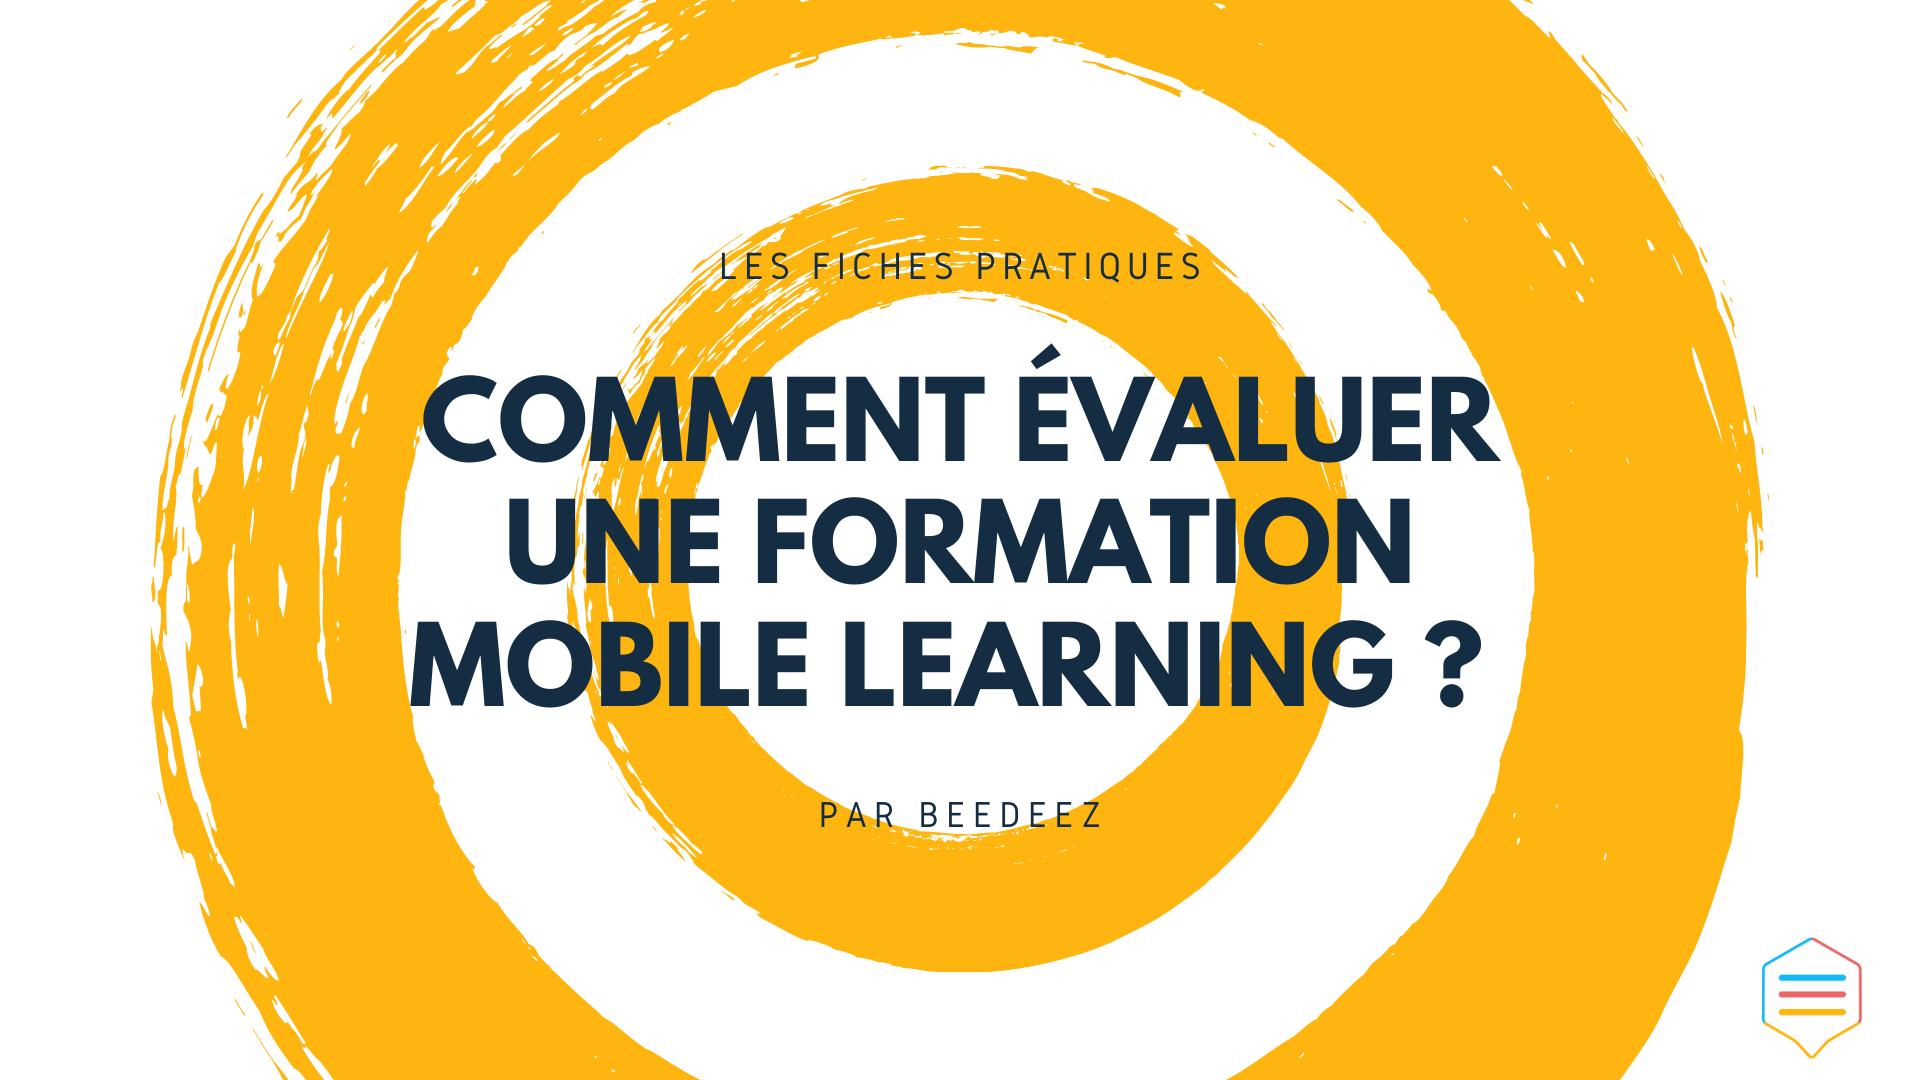 comment évaluer une formation mobile learning